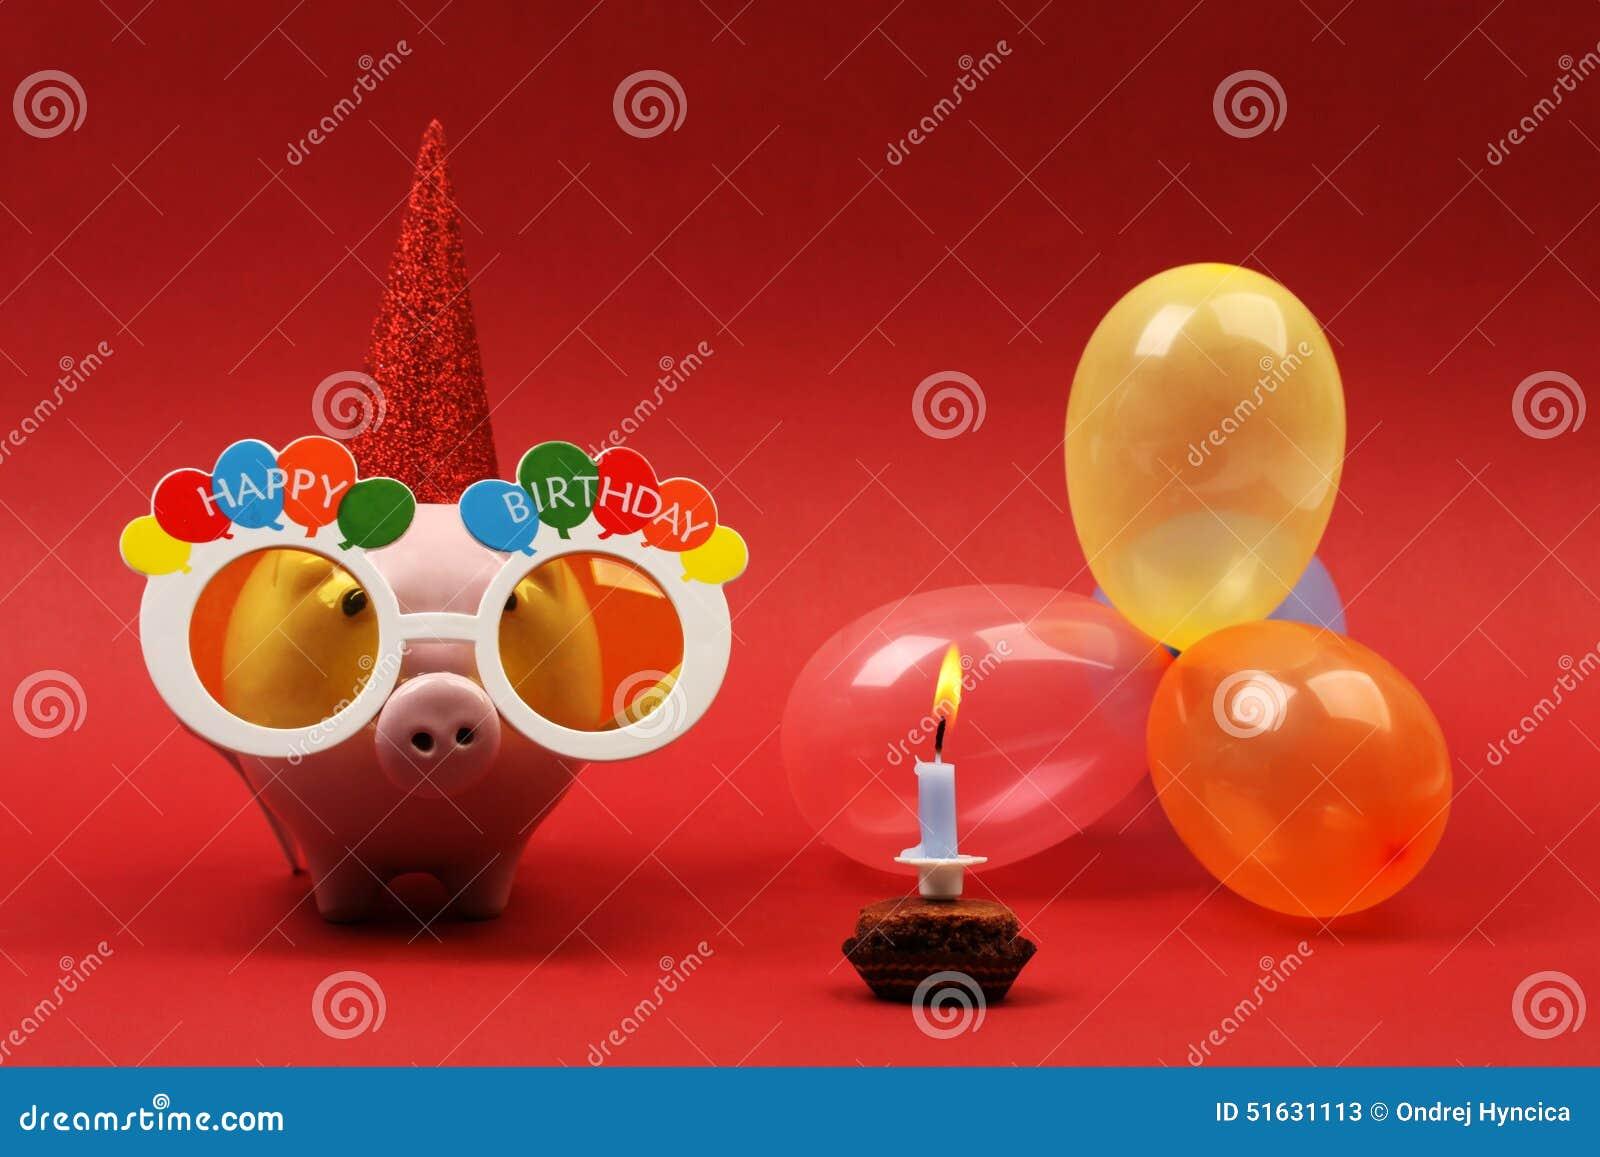 Happy Birthday Piggy Cake